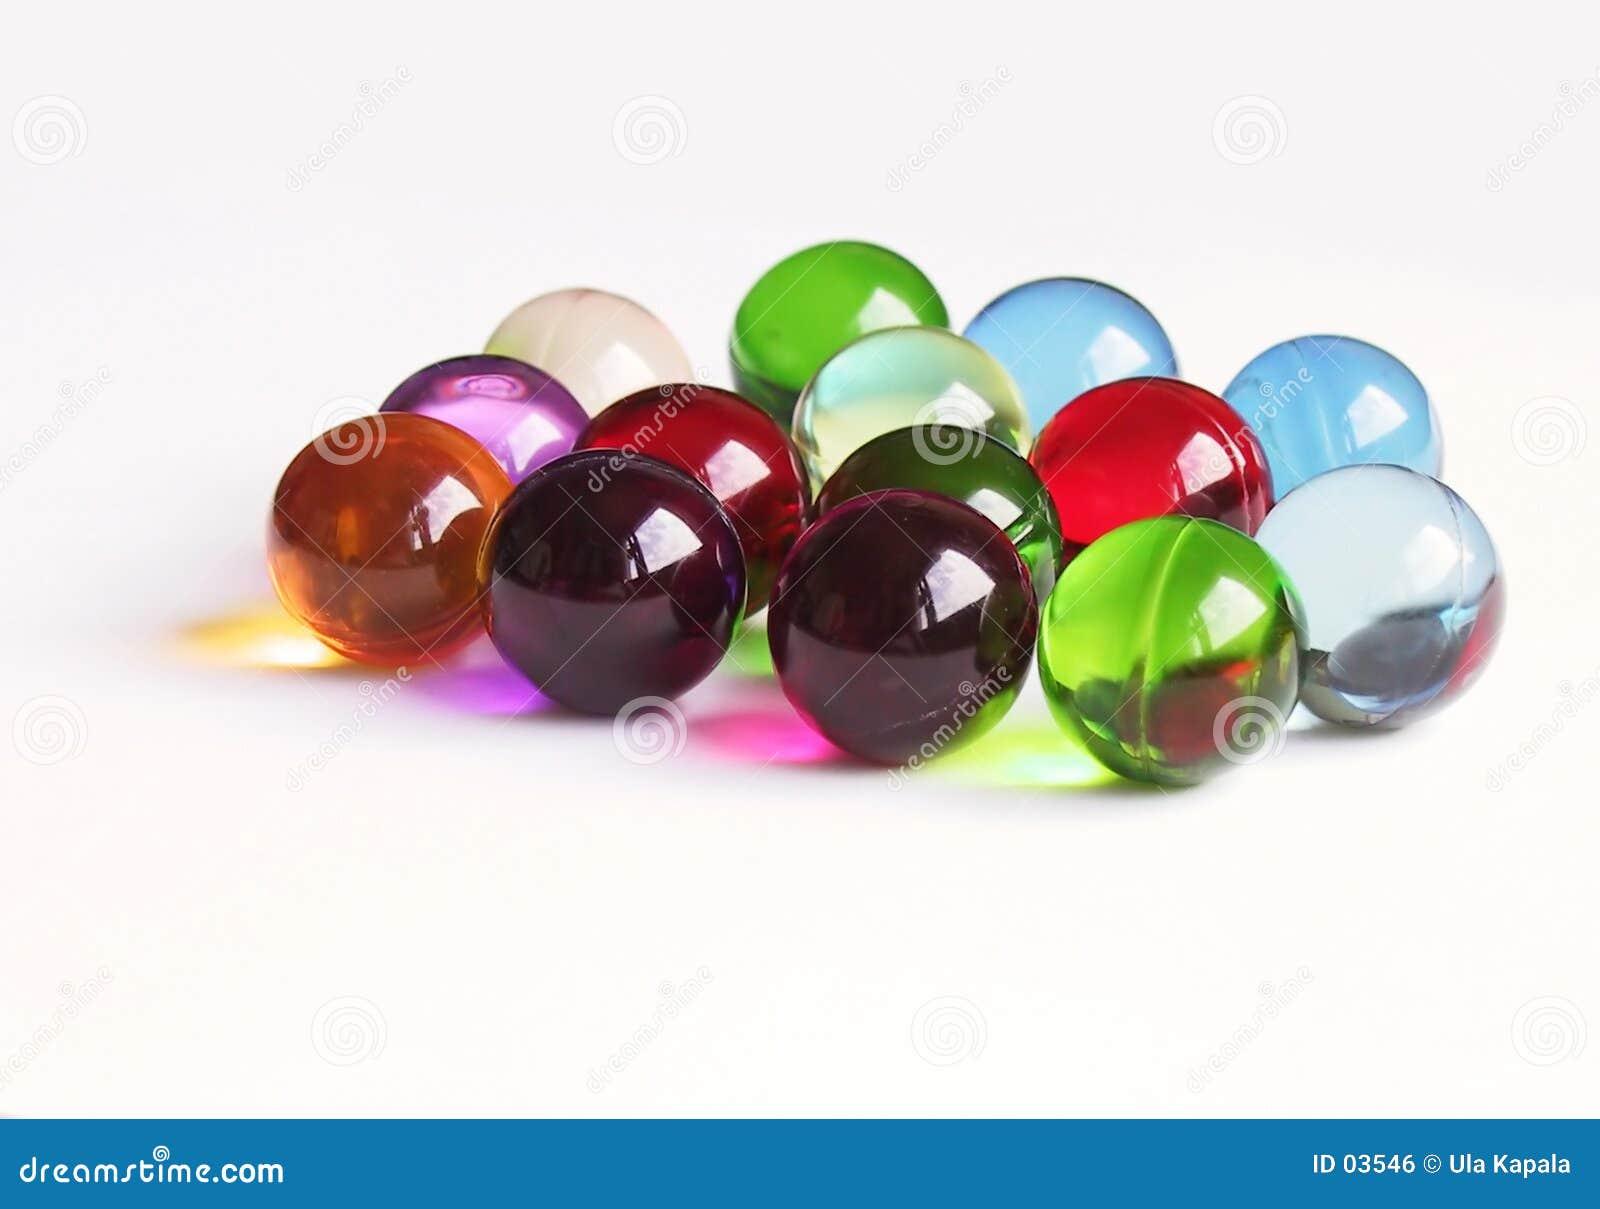 Farbige Badkugeln